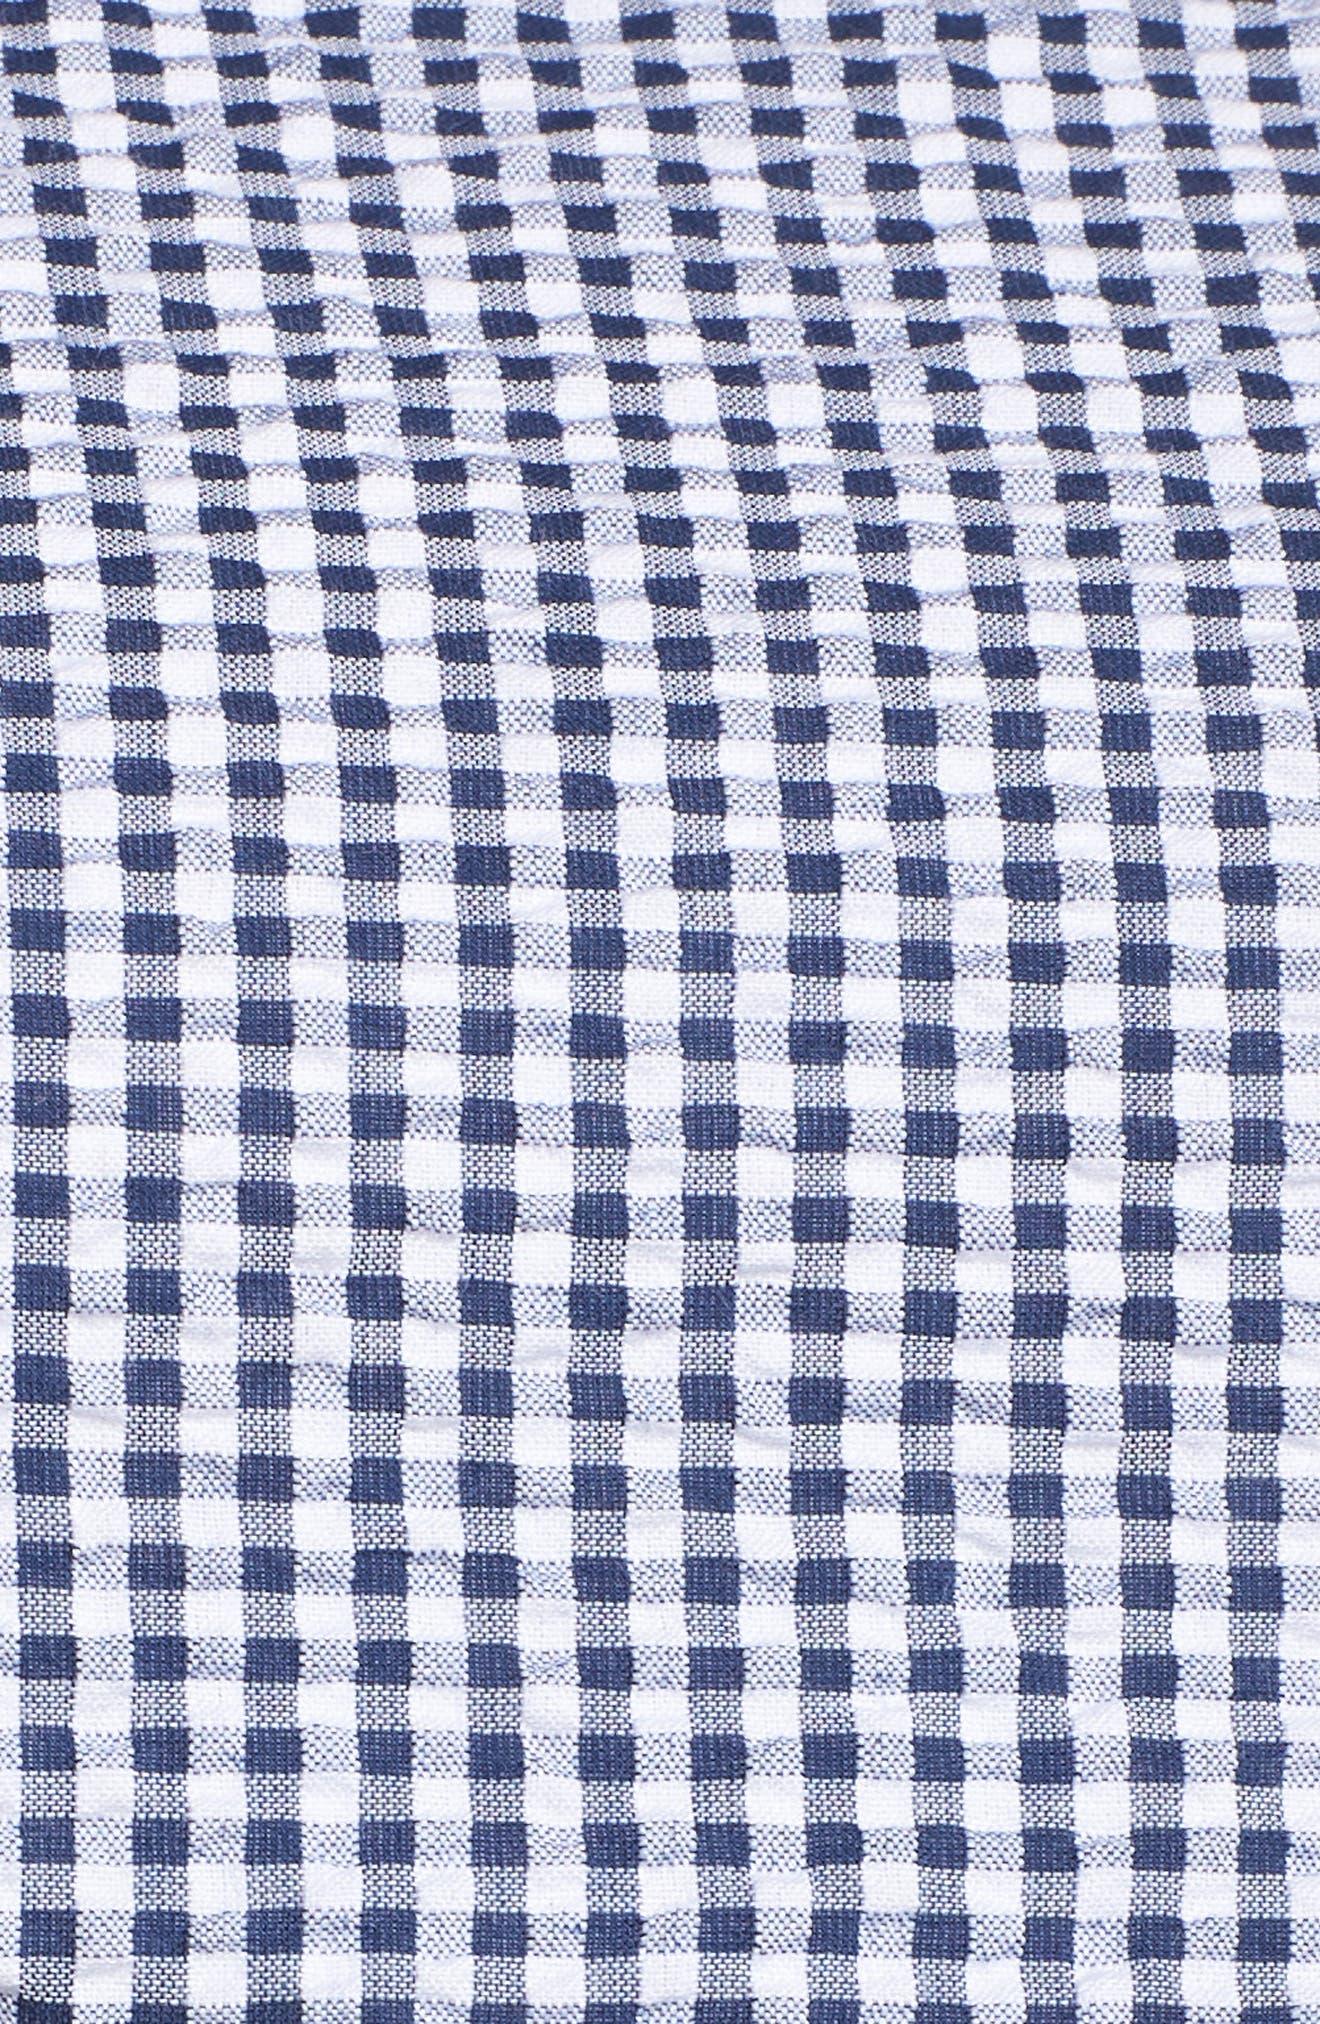 Belted Gingham Seersucker Fit & Flare Dress,                             Alternate thumbnail 6, color,                             Navy/ Ivory